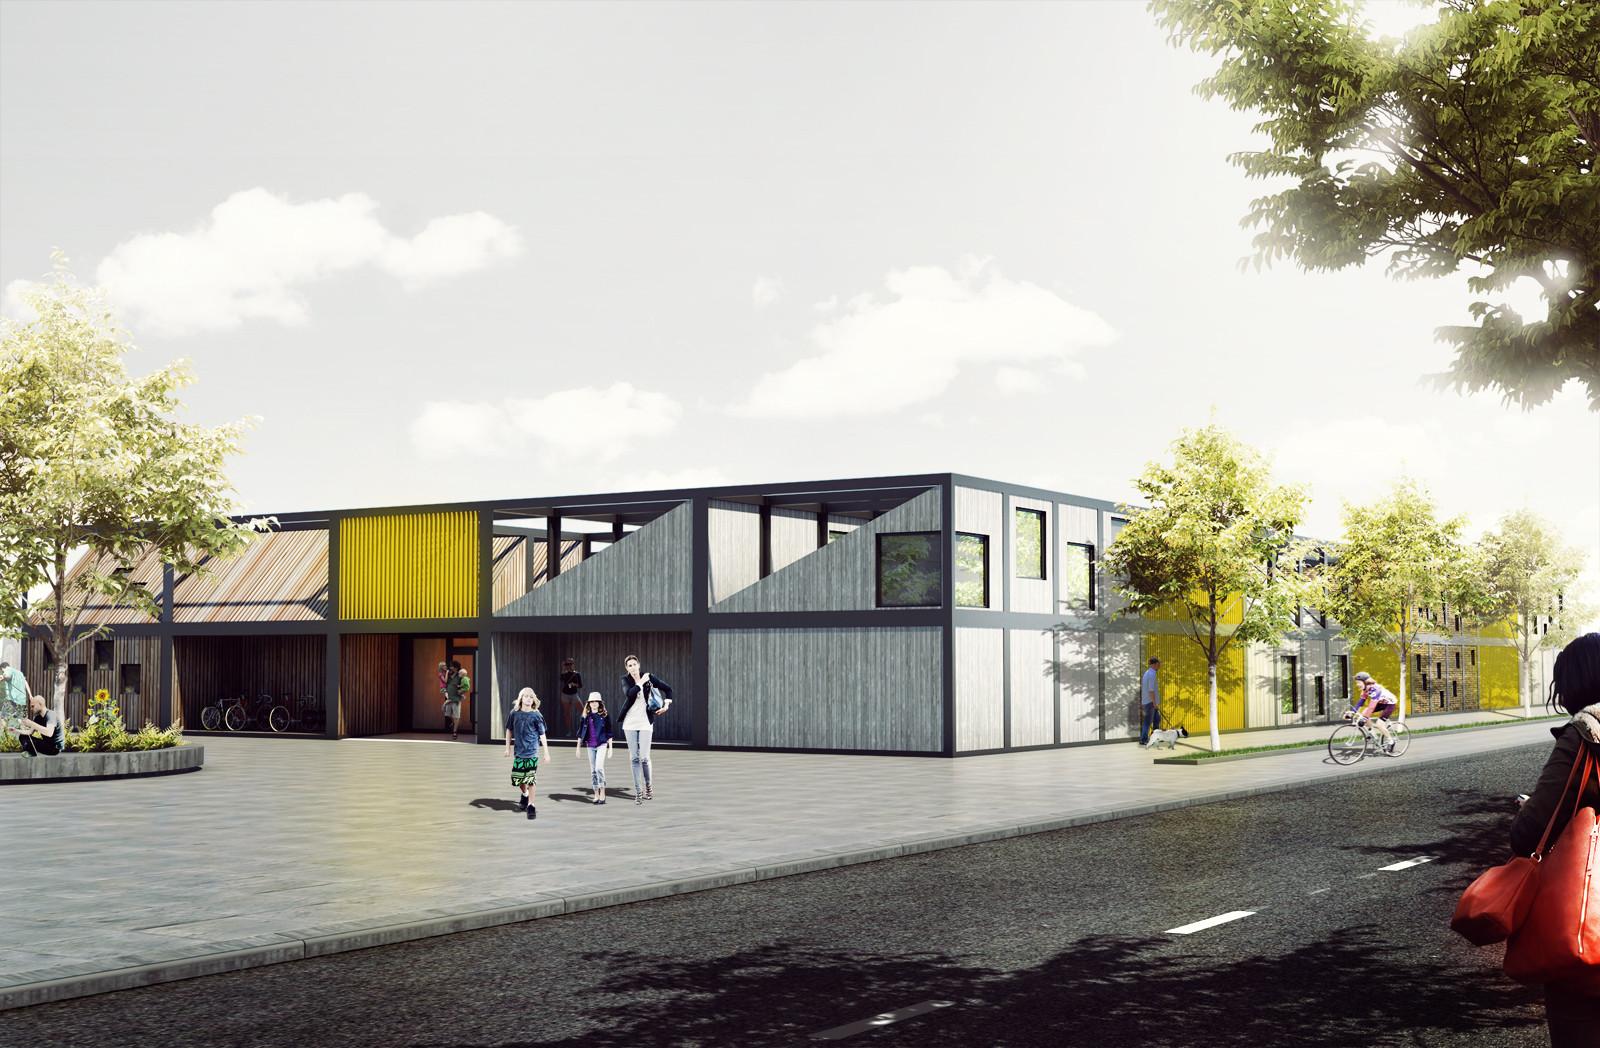 'Kids' City' - Modular Kindergarten Proposal / Adam Wiercinski, Courtesy of Adam Wiercinski